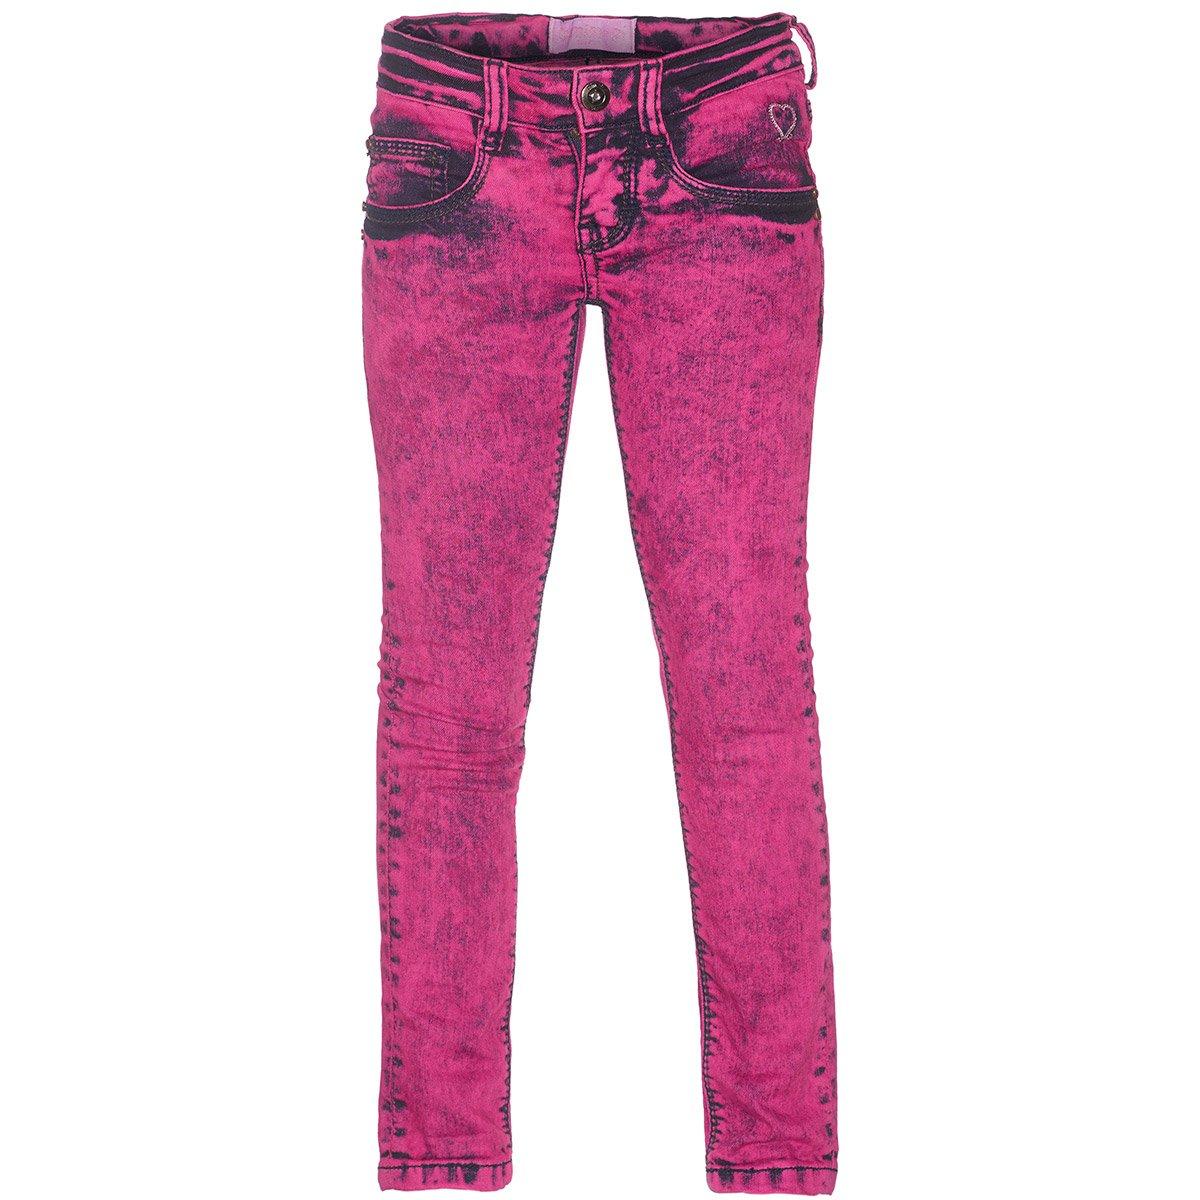 Mim Pi Pink Pants